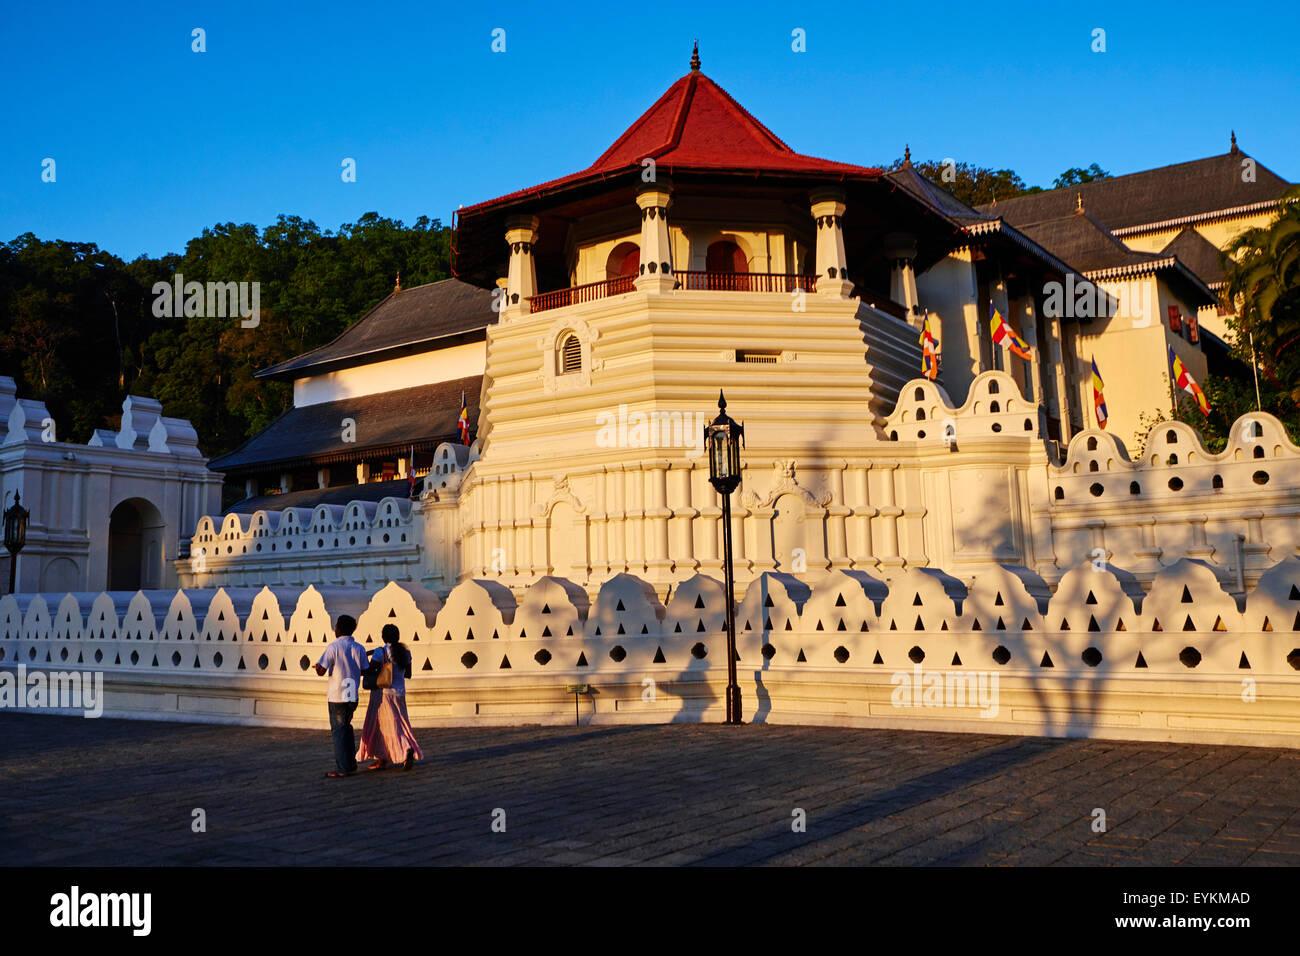 Sri Lanka, Ceylon, North Central Province, Kandy, UNESCO World Heritage city, Tooth's temple Stock Photo